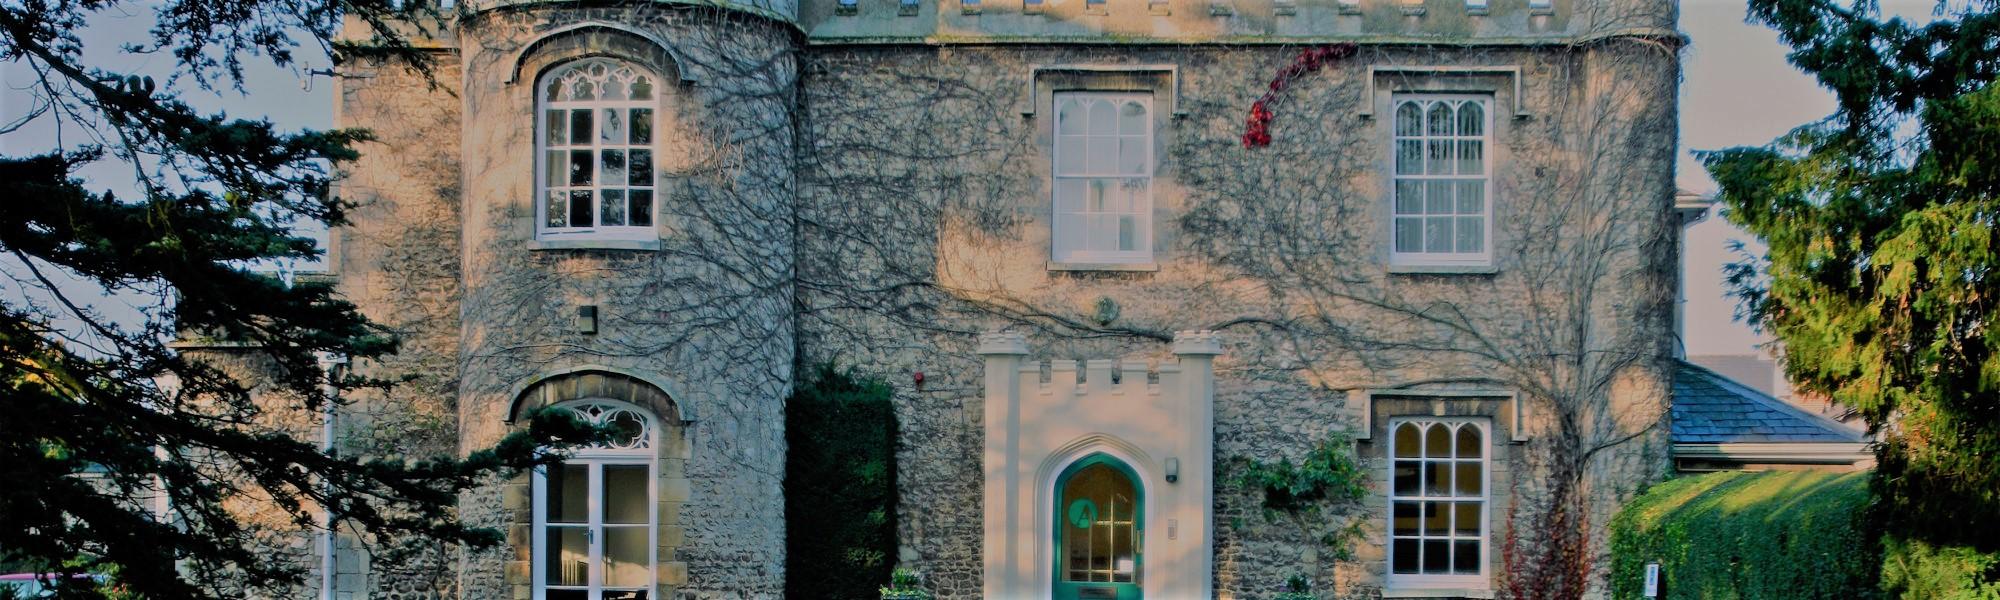 Parker Planning Services - Town Planning Consultants - Suffolk - Bury St Edmunds